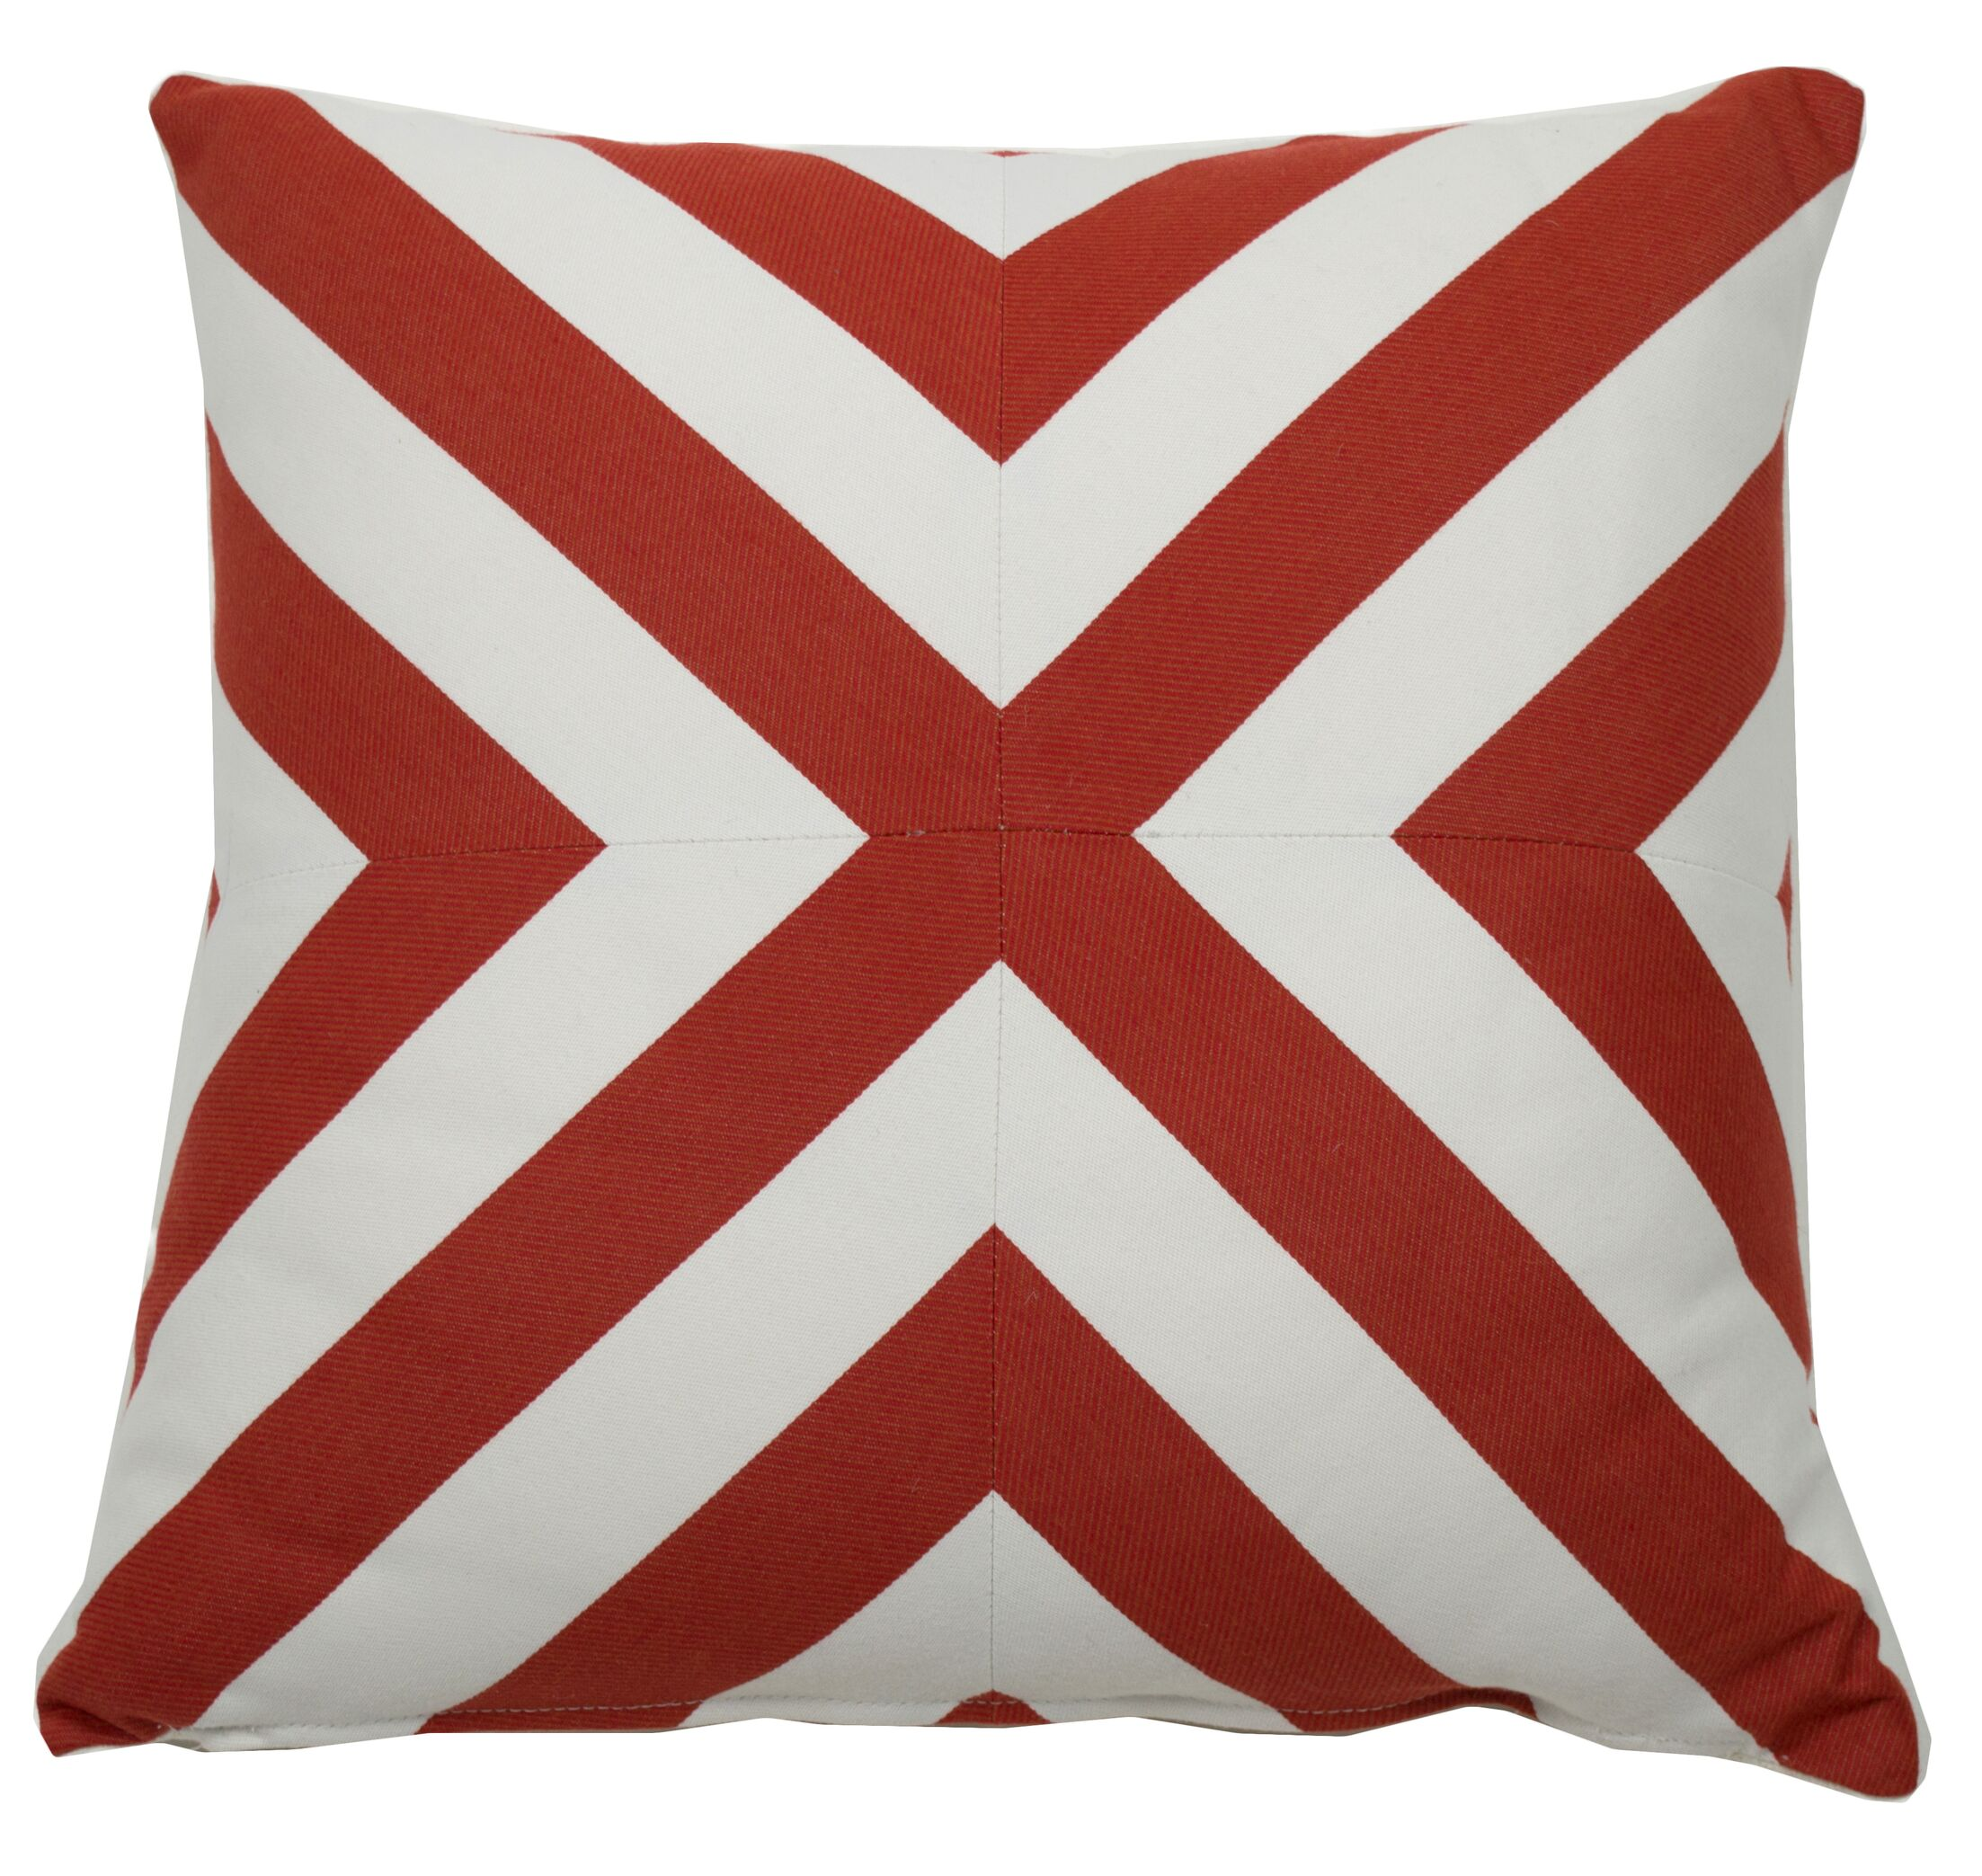 Halo Indoor/Outdoor Throw Pillow (Set of 2) Size: 22